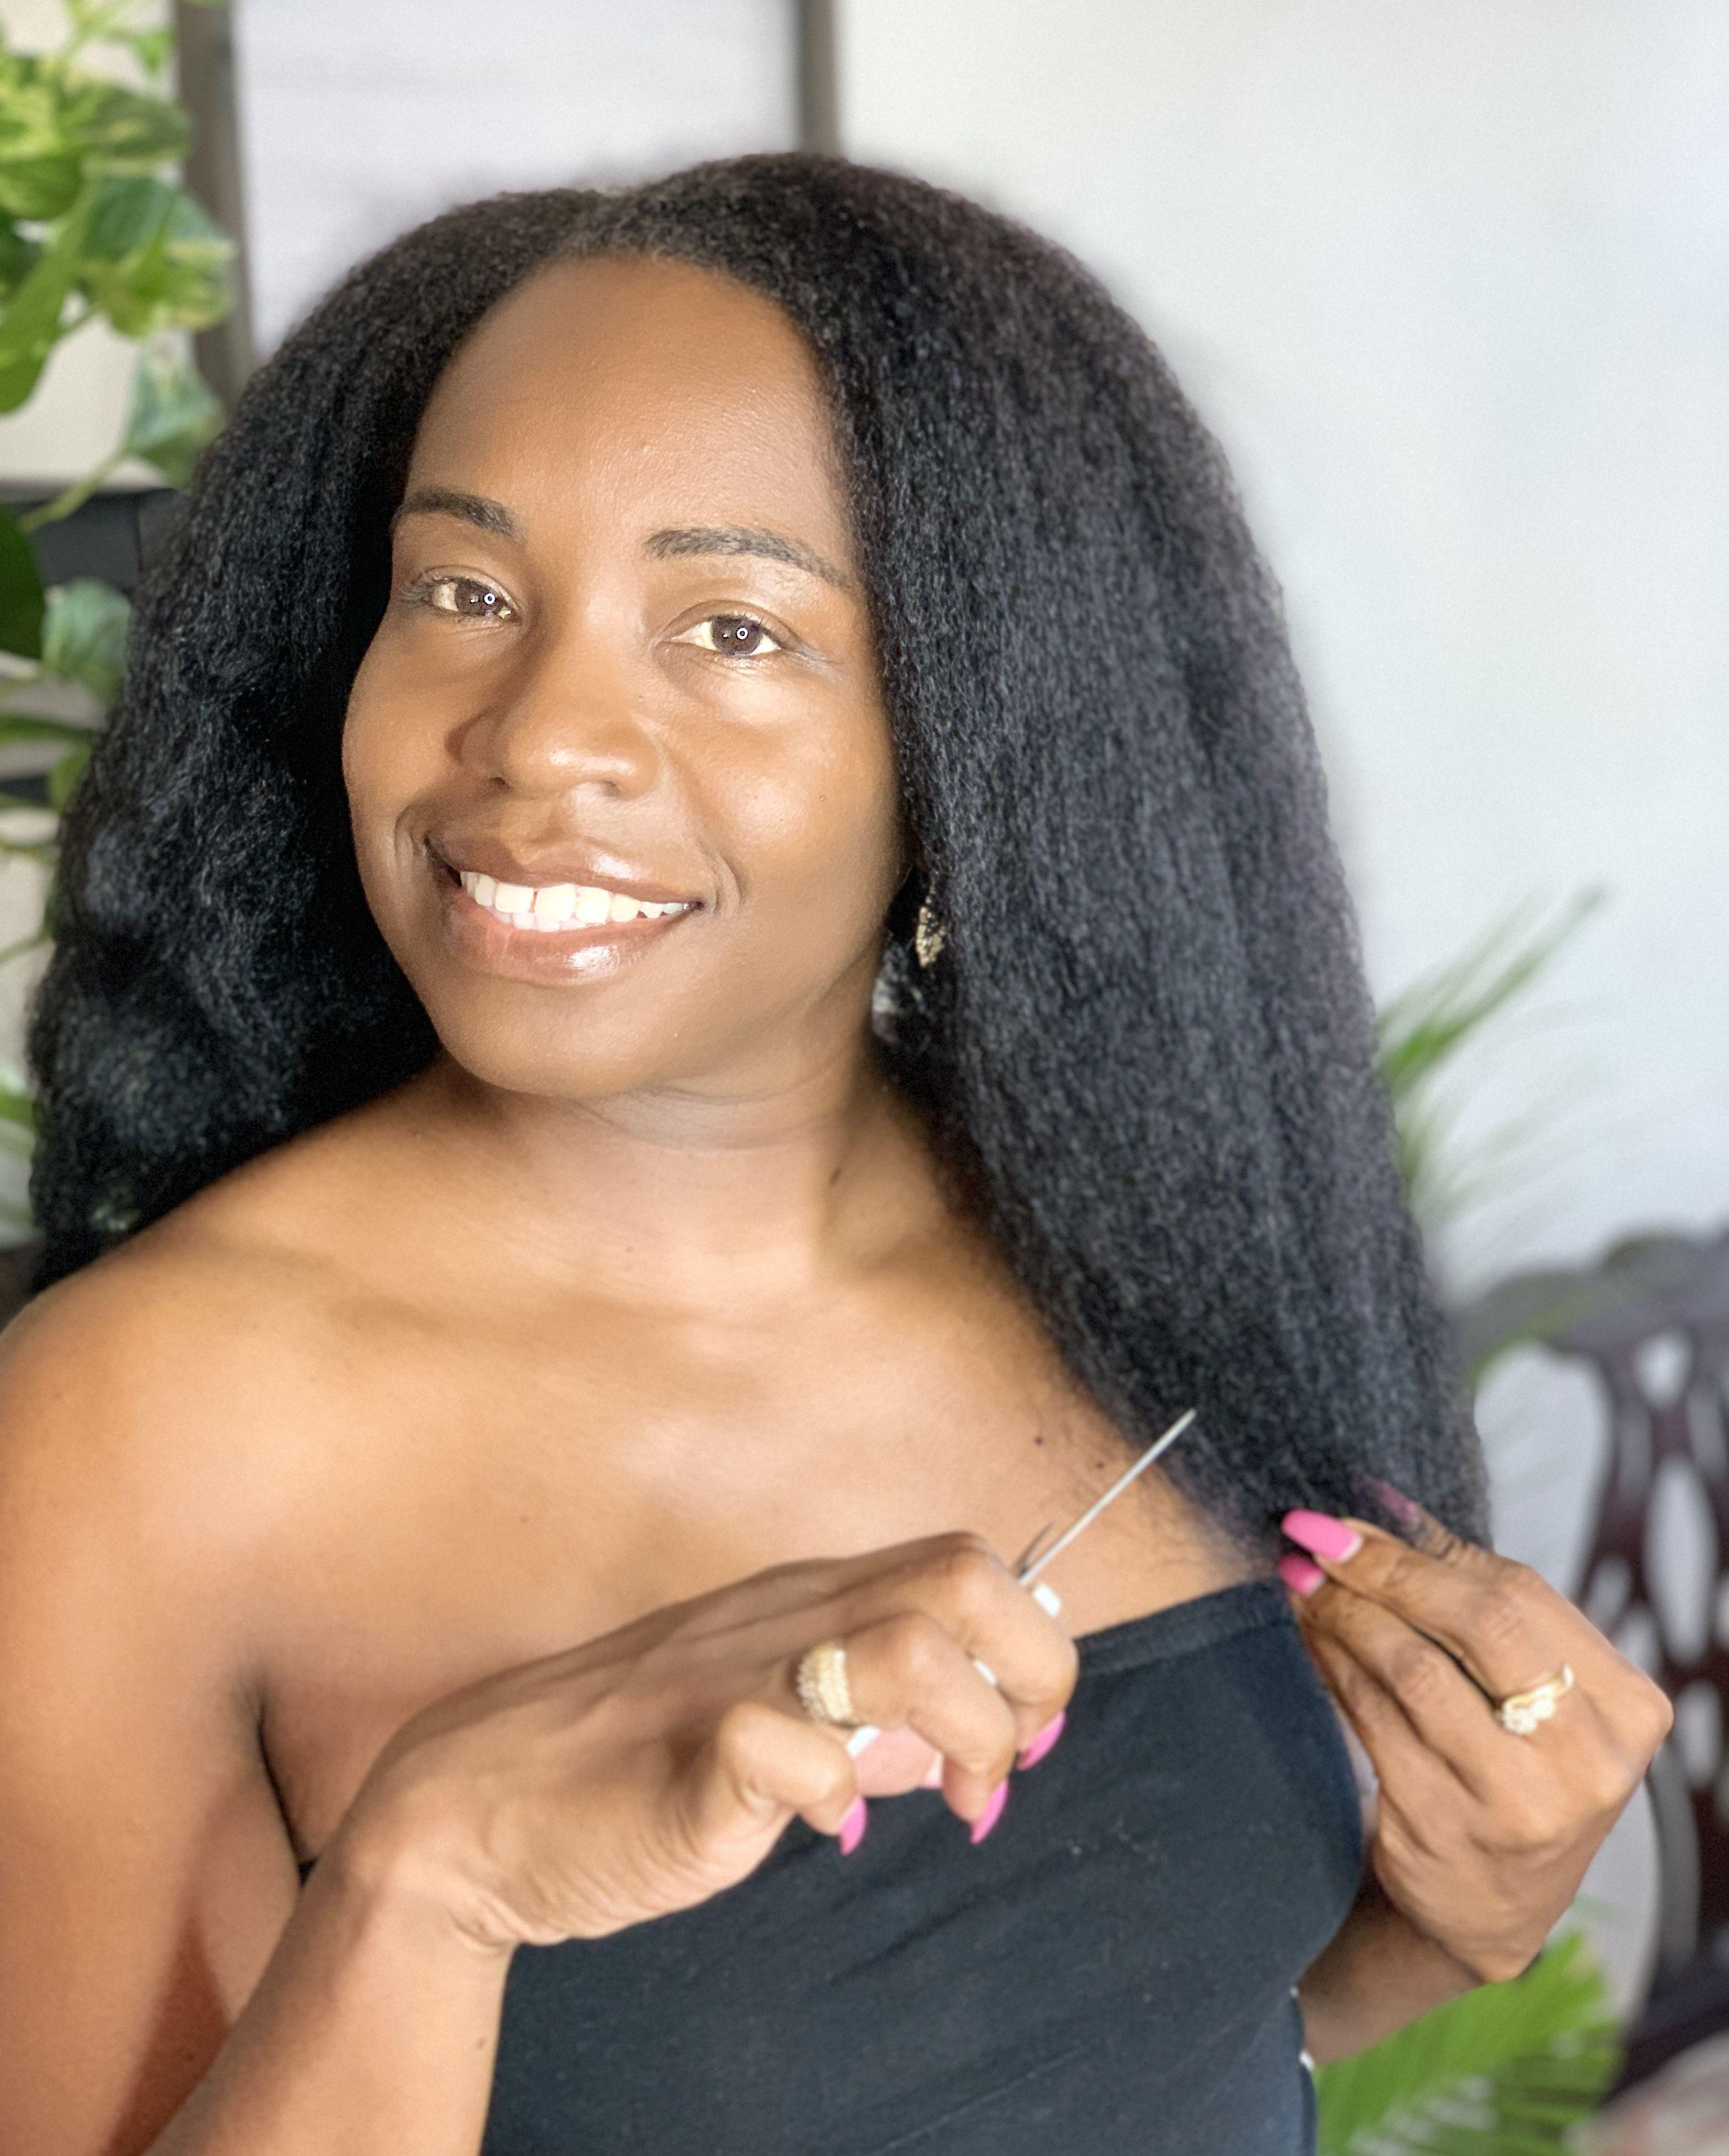 Lunar Hair Care Best Days to cut hair to encourage hair growth